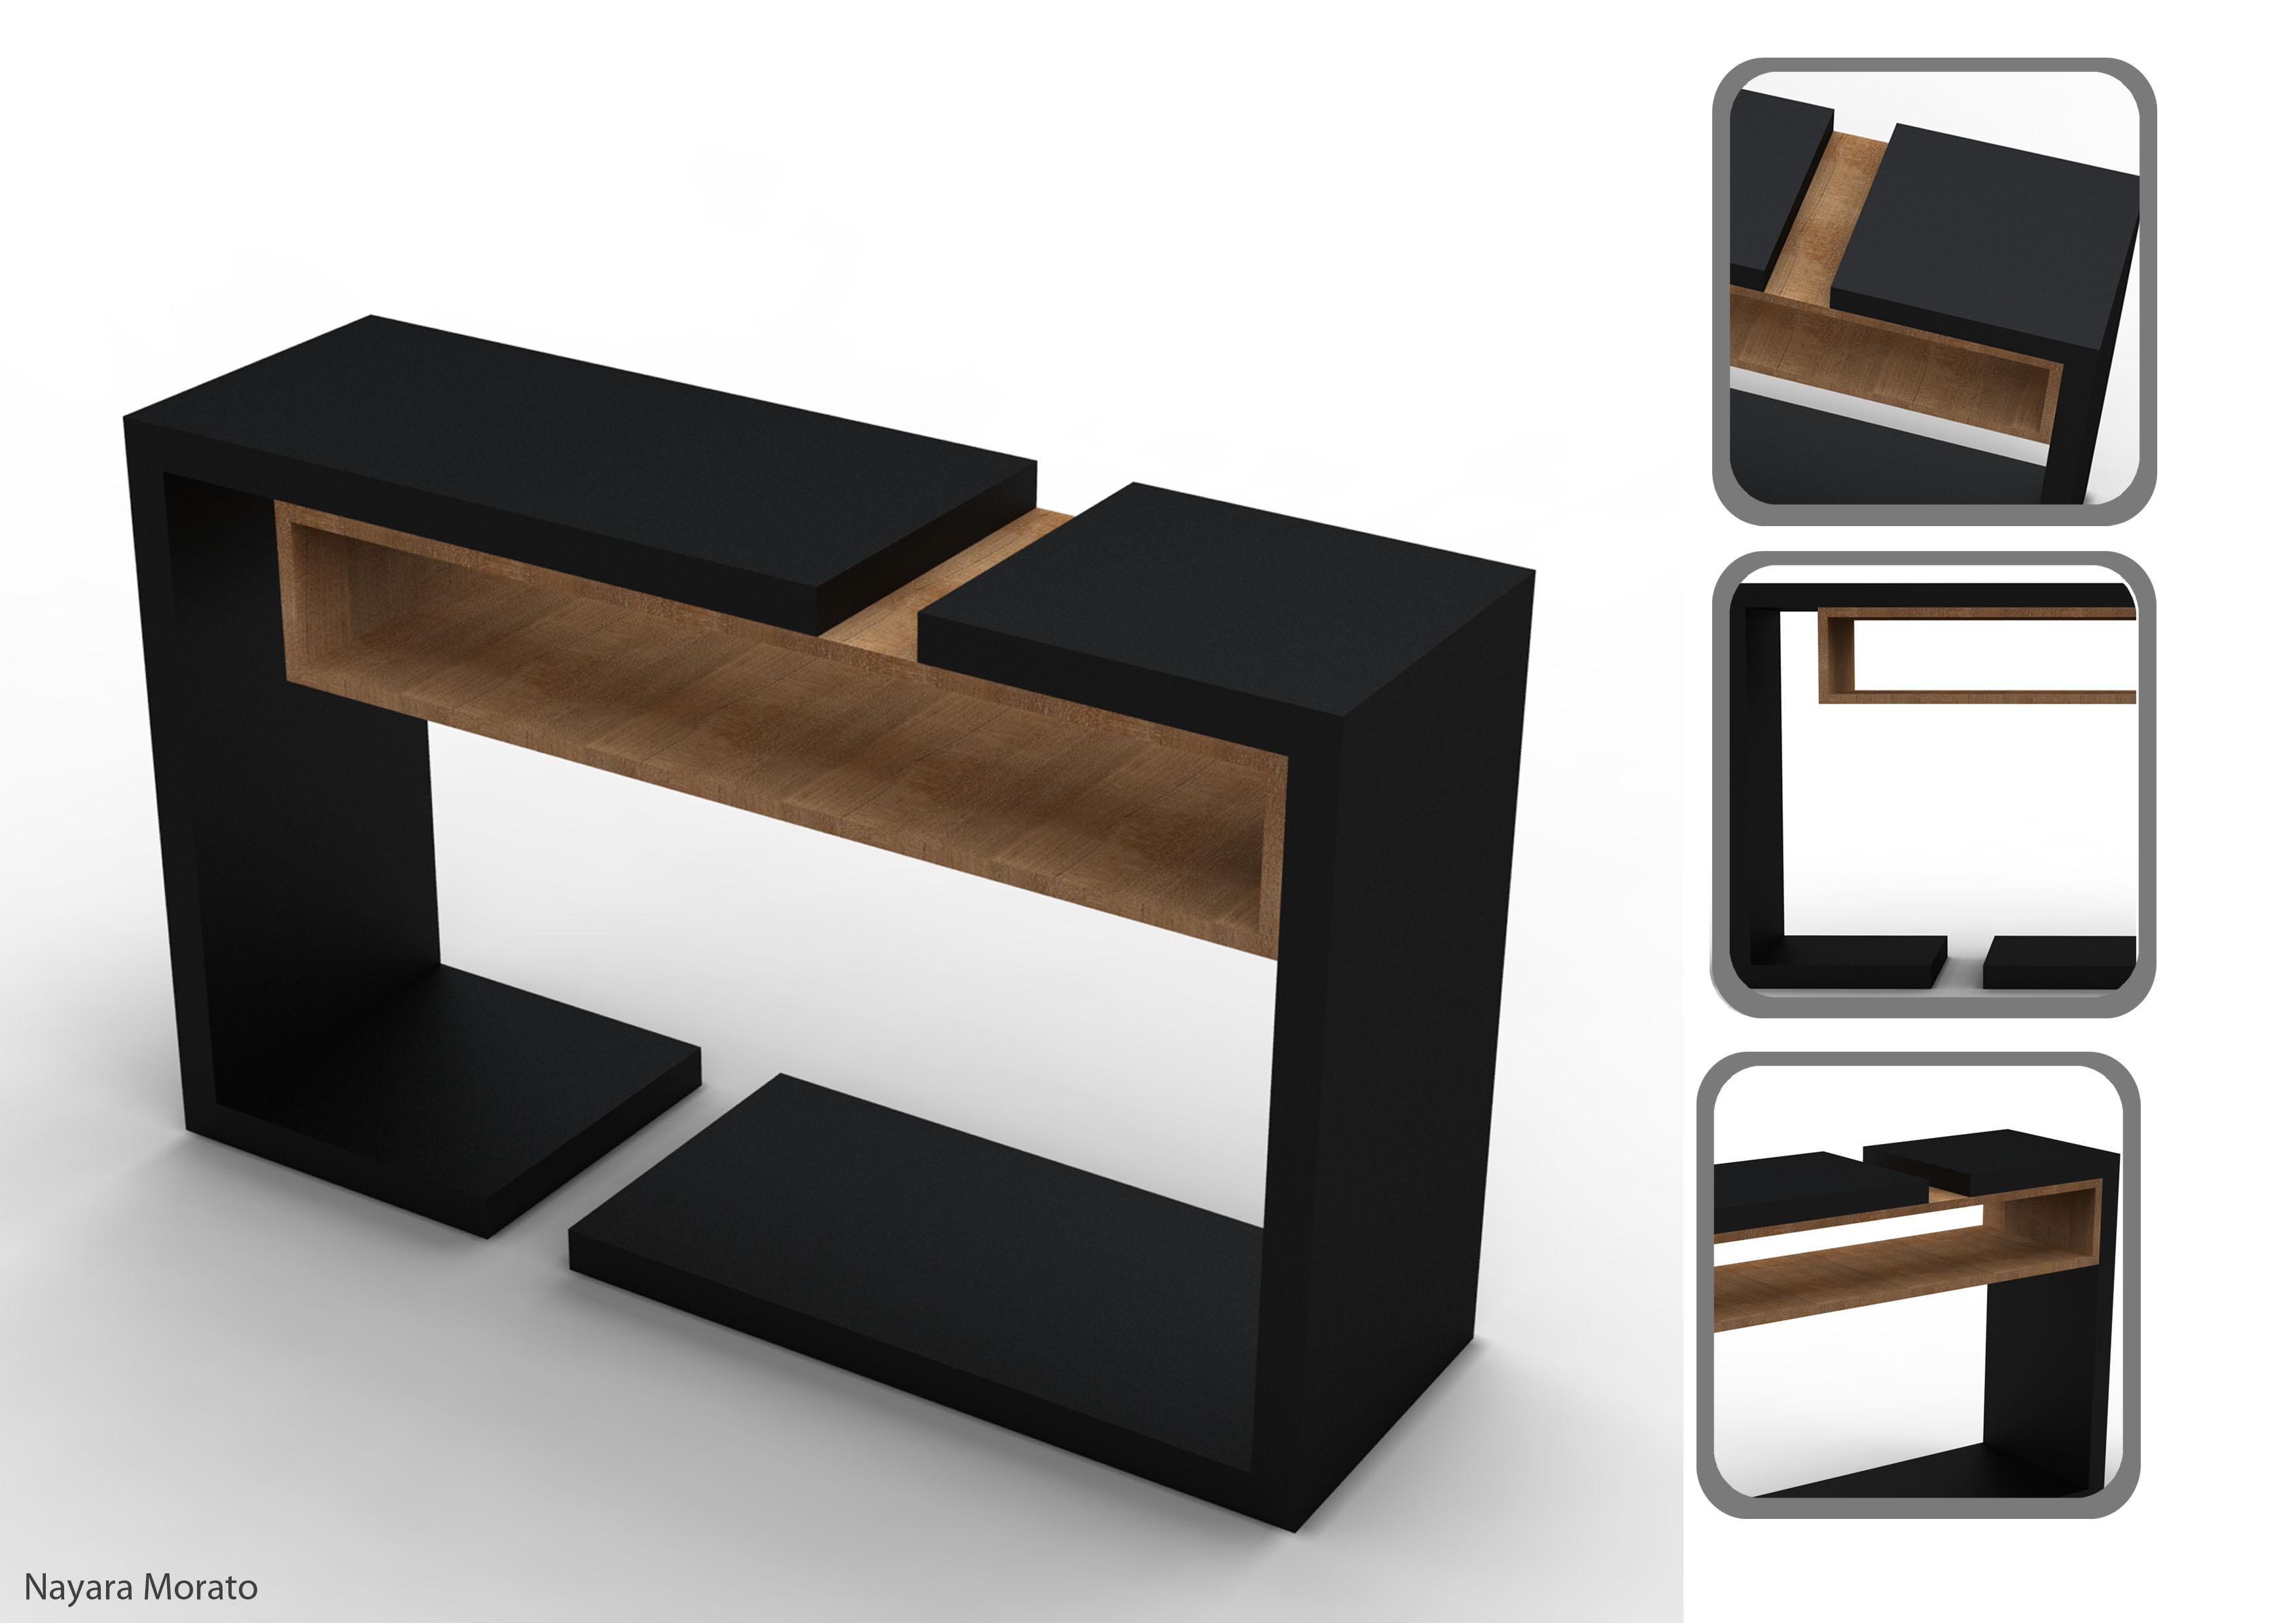 Armario Itatiaia Completo ~ Furniture by Nayara Morato at Coroflot com